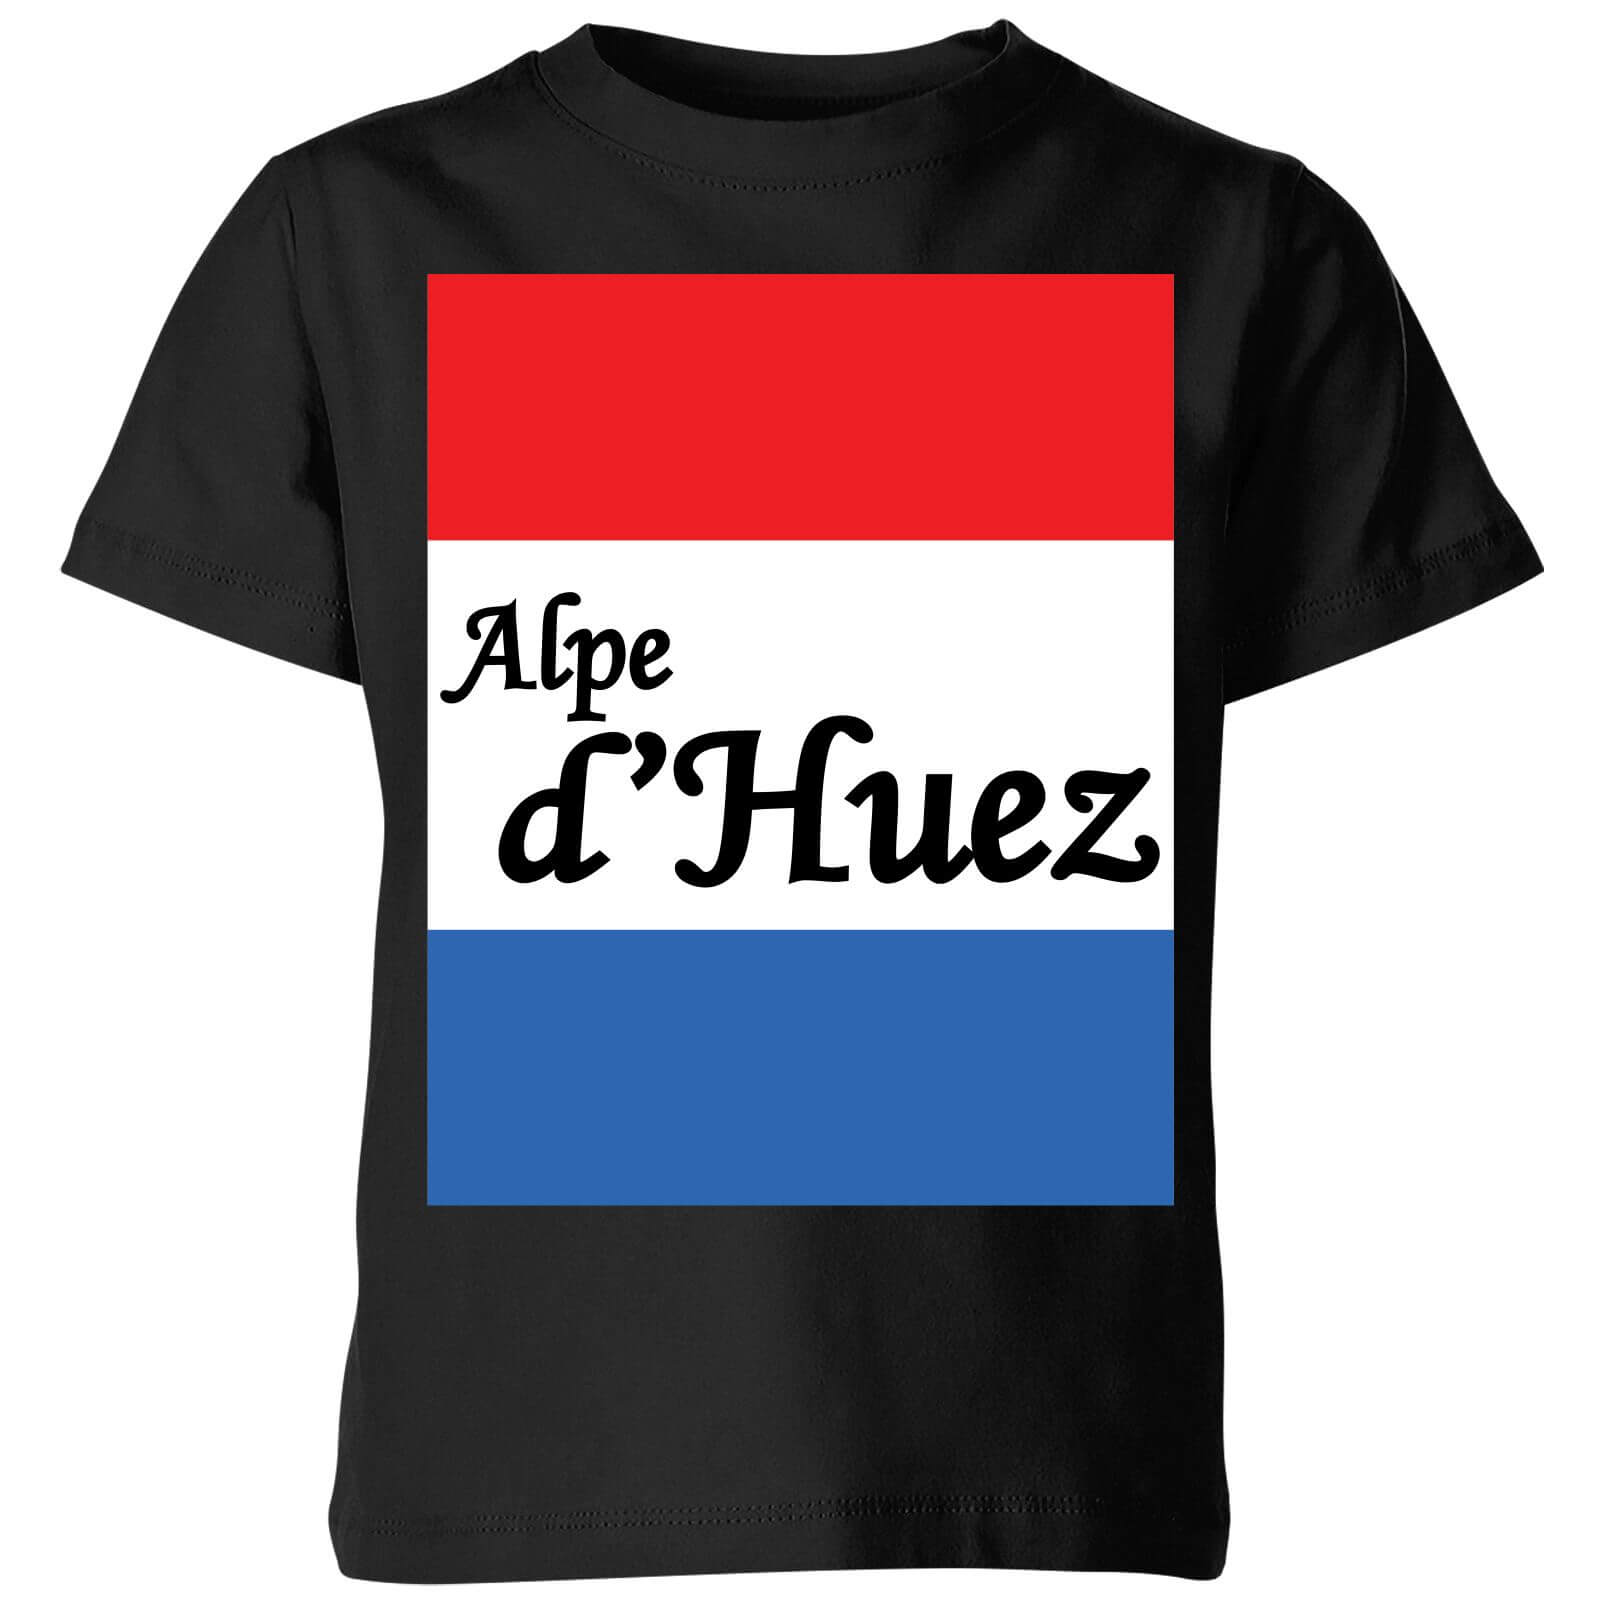 Summit Finish Alpe Dhuez Kids T-shirt - Black - 3-4 Years - Black